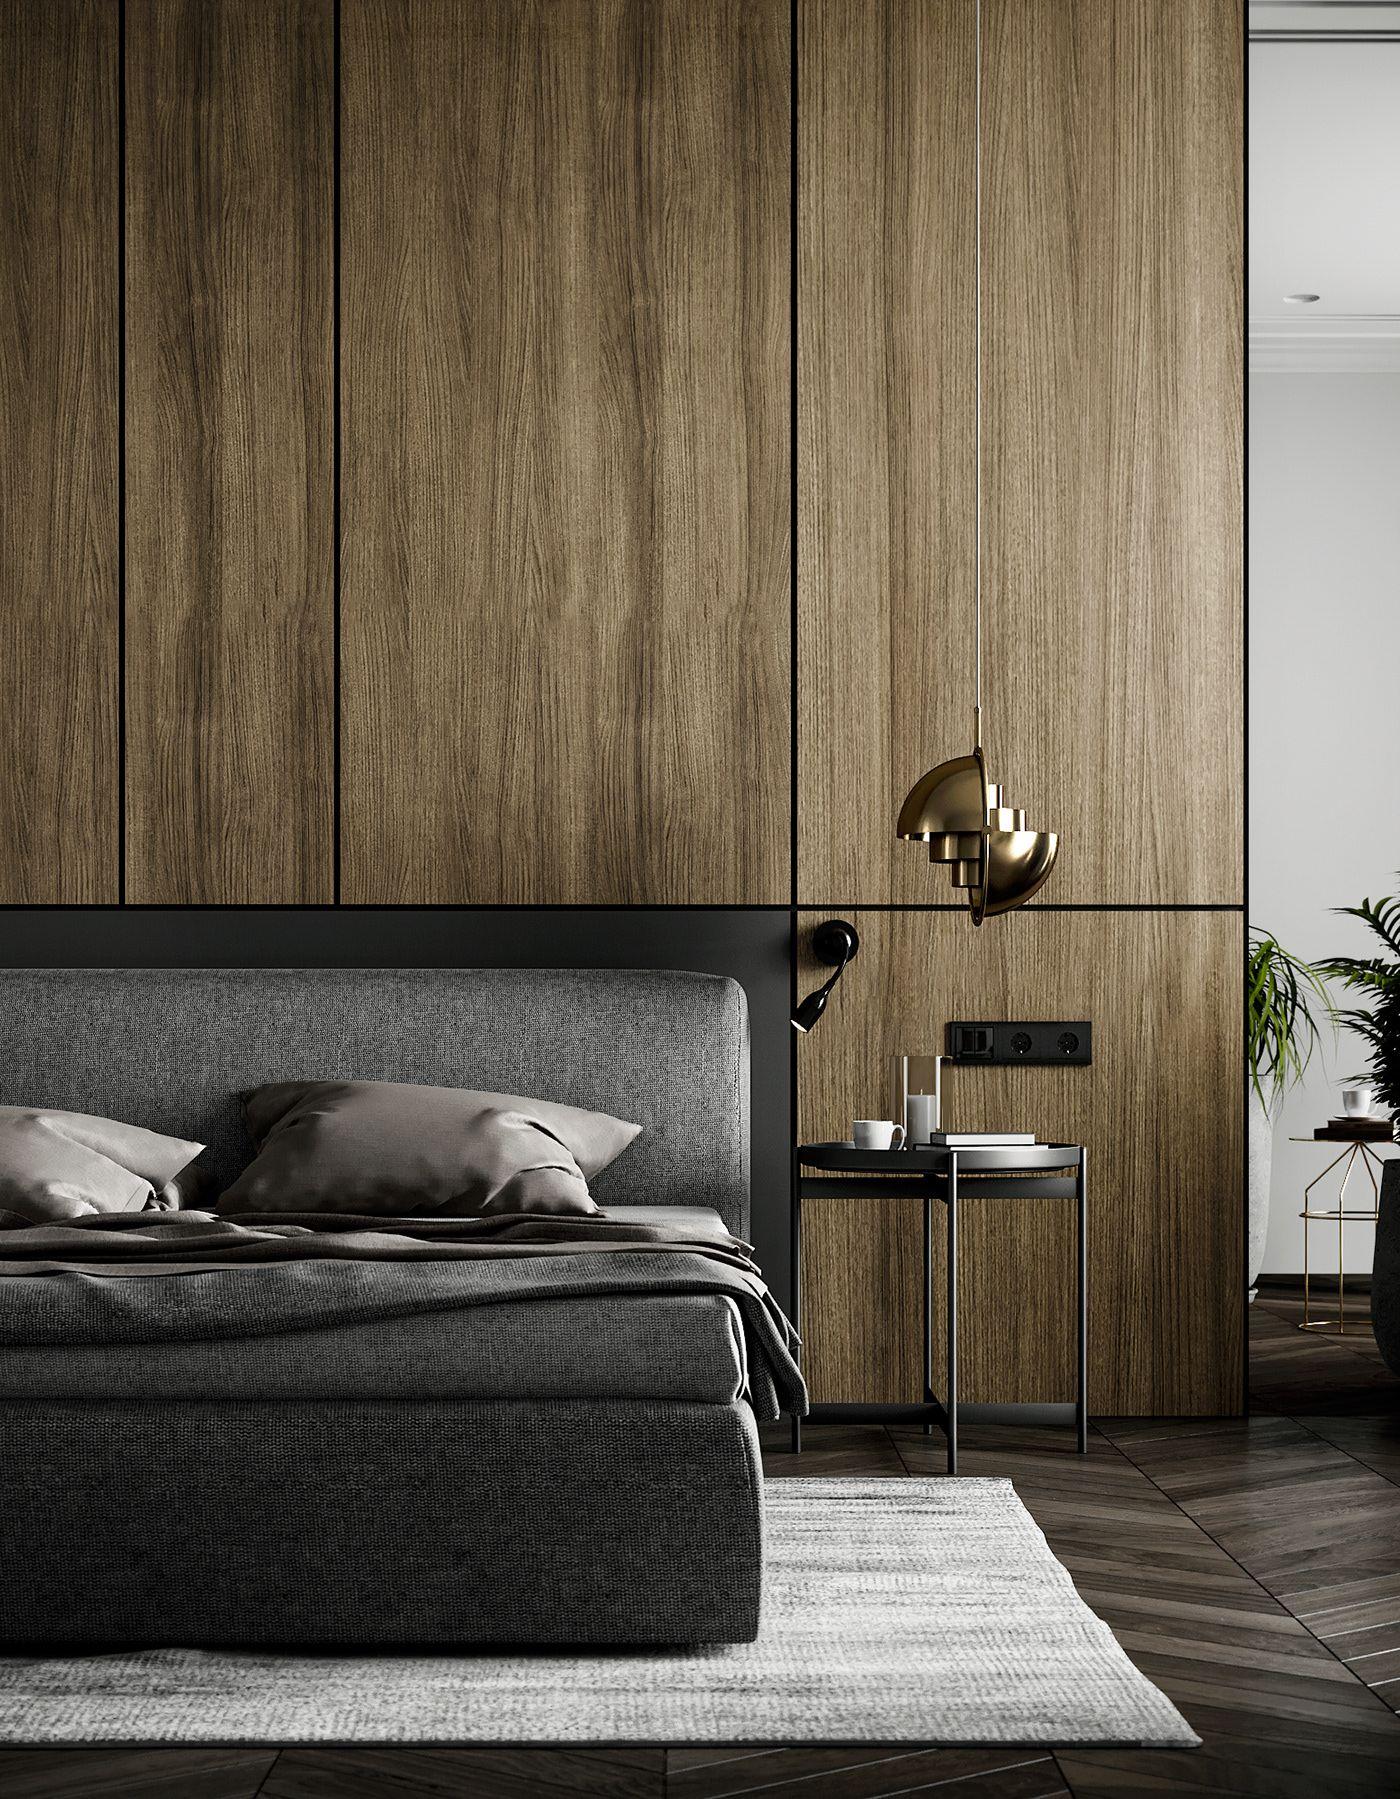 Interior design-ideen wohnzimmer mit tv interior design and visualization of nice appartments f on behance